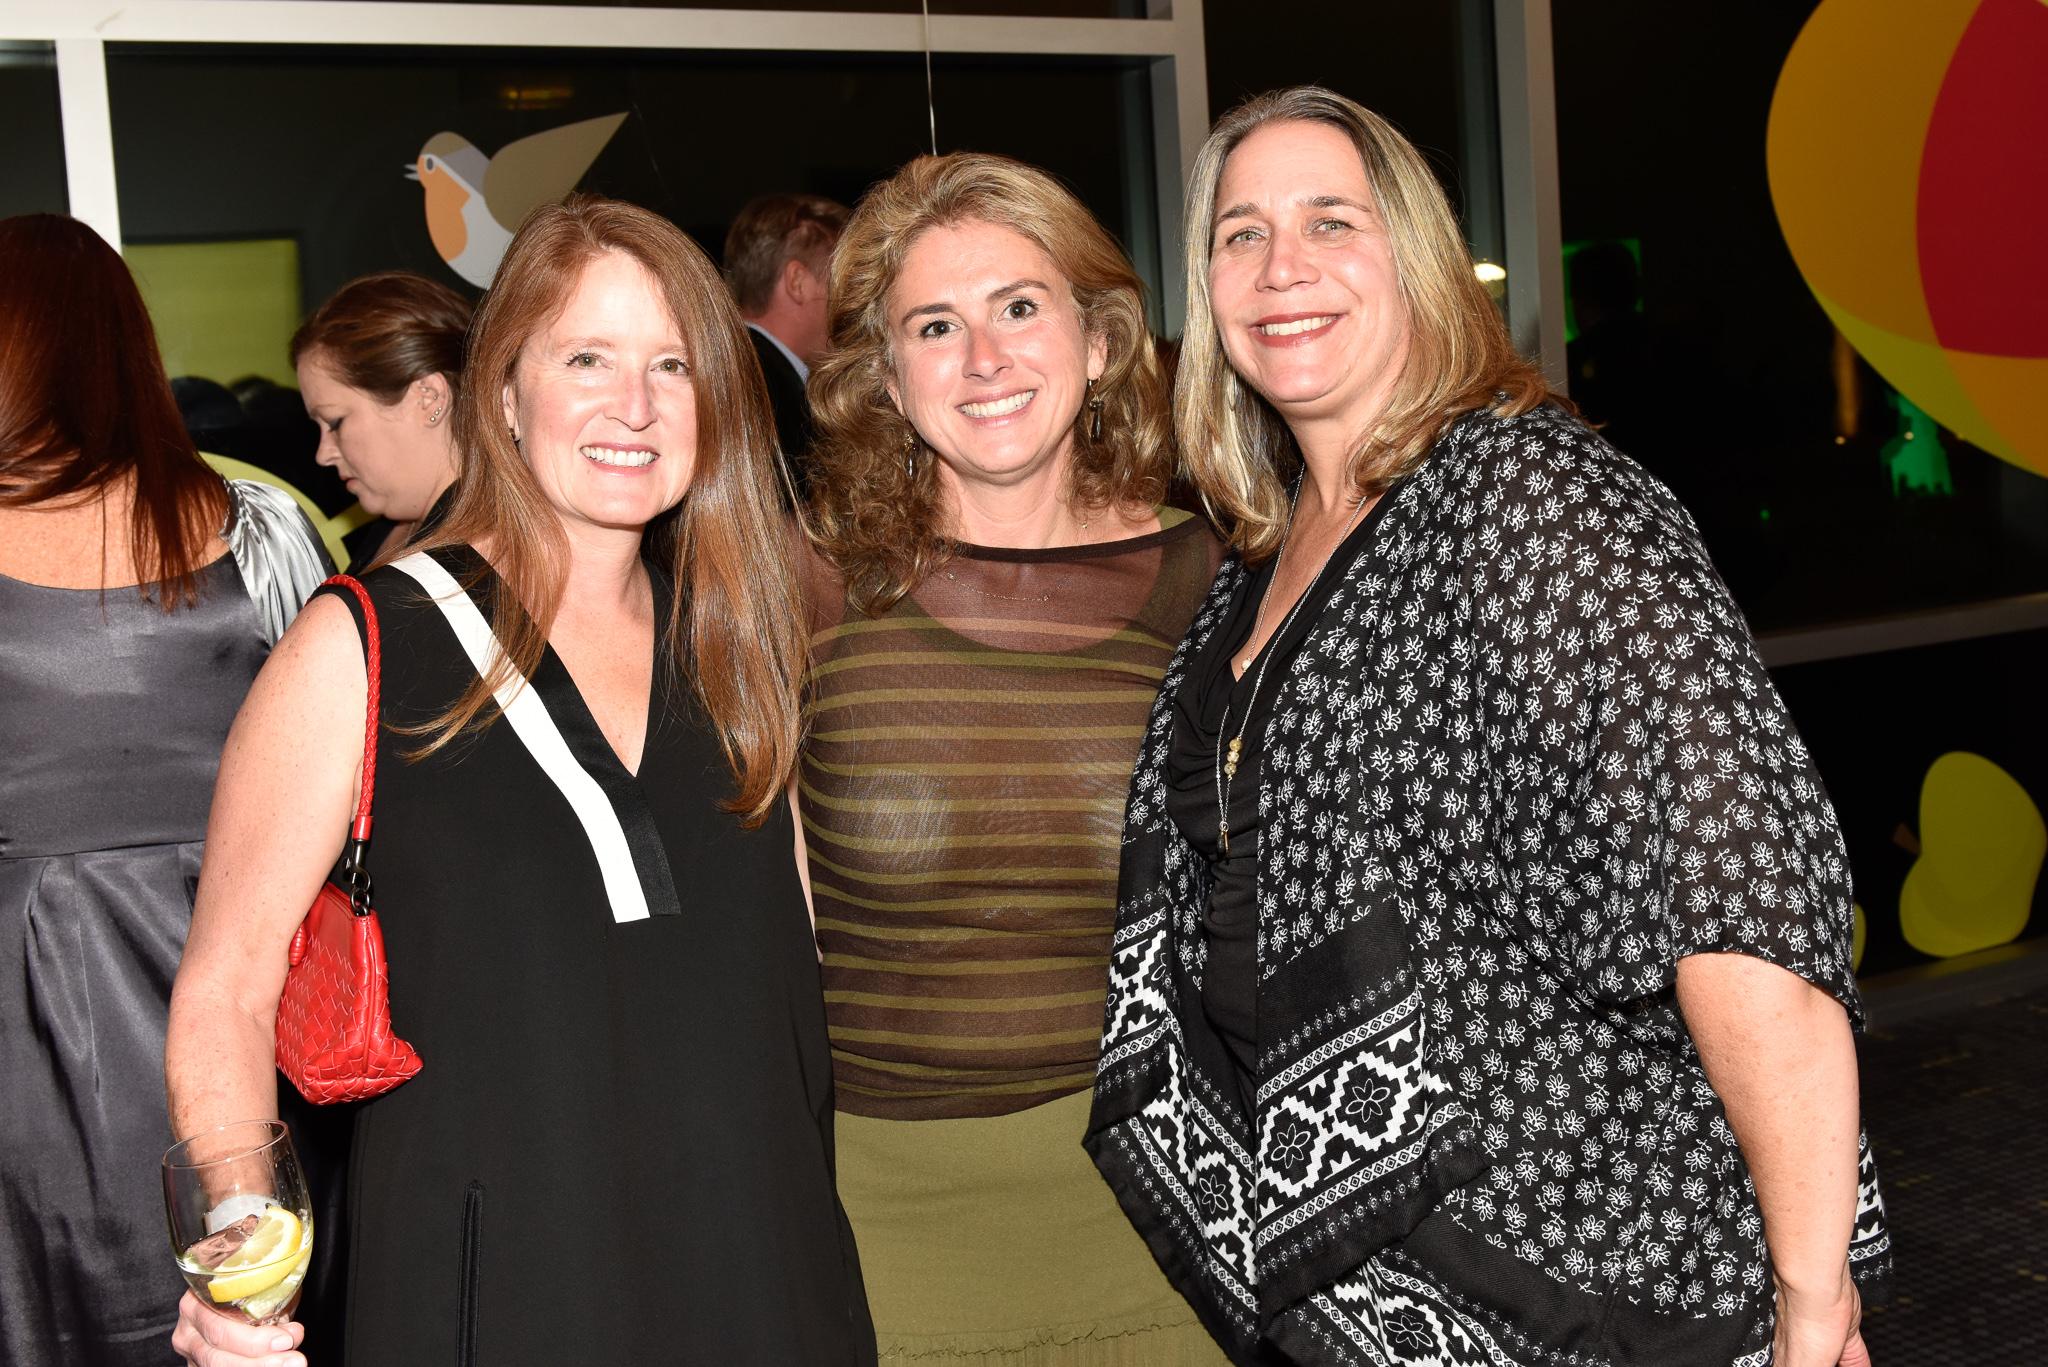 Grace Oppenhimer, Vanessa Frosini, Kerry Gilbertson